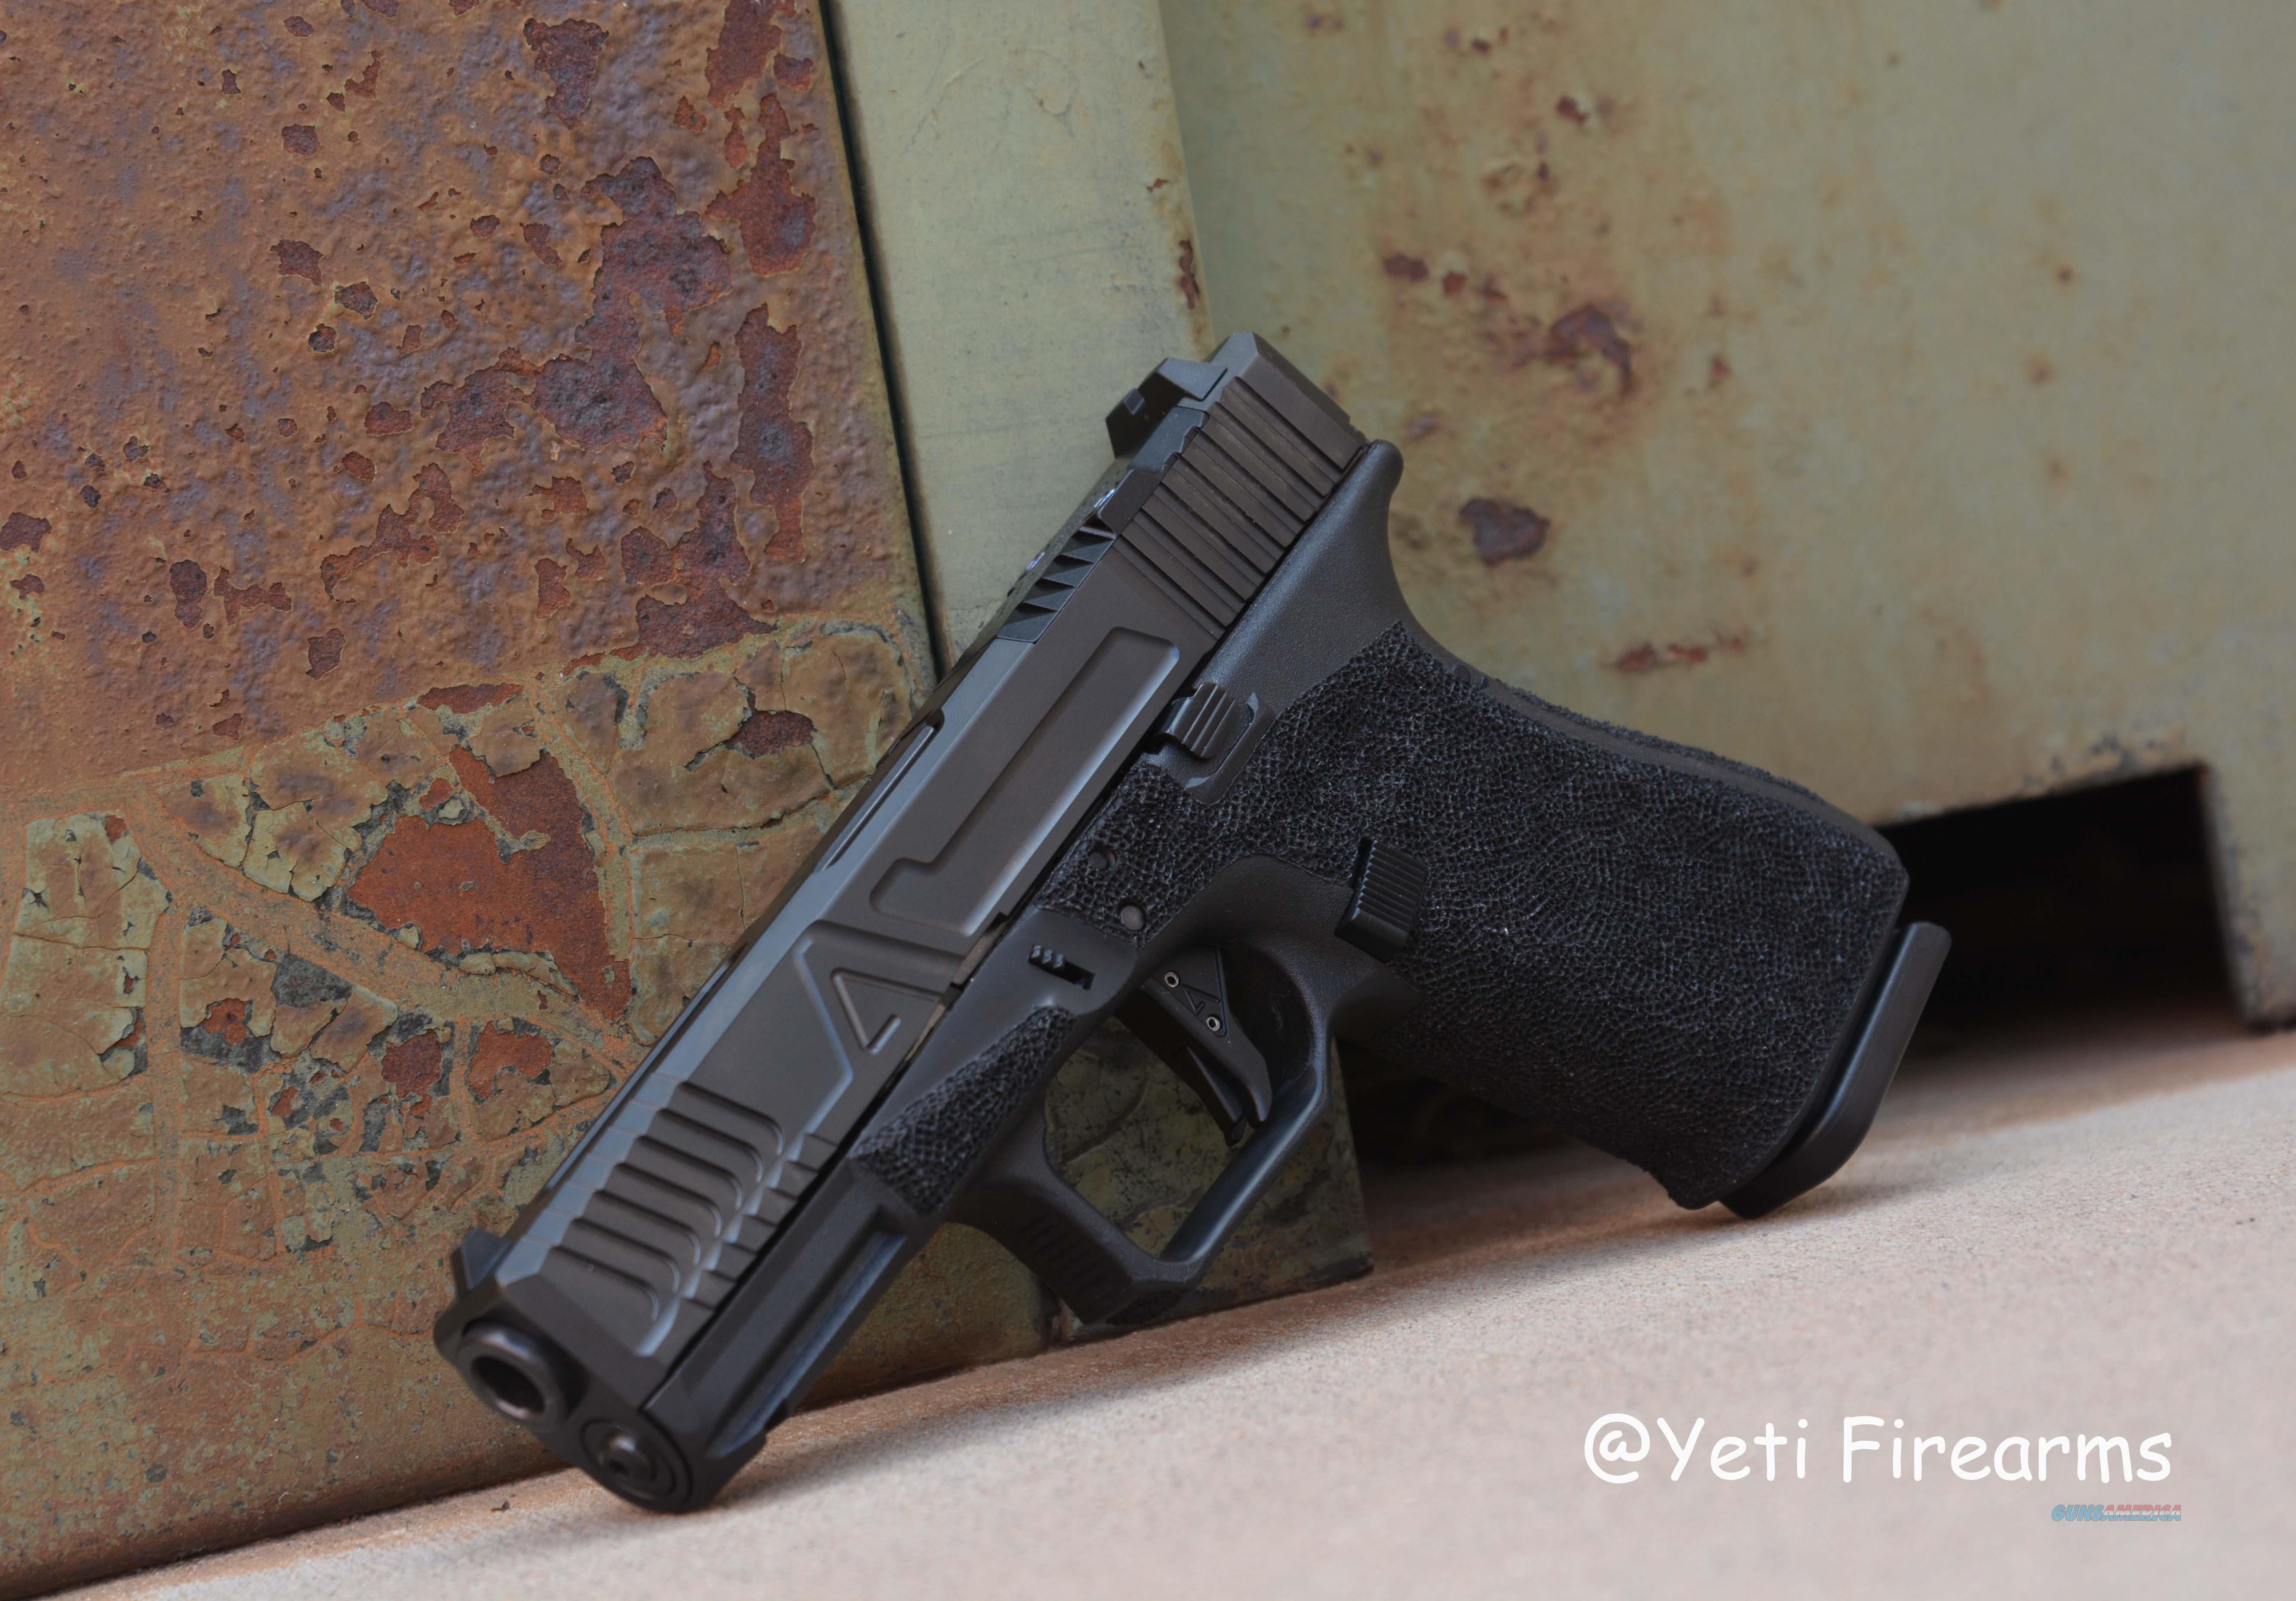 Agency Arms Glock 19 G4 9mm Hybrid No CC Fee BLK  Guns > Pistols > Glock Pistols > 19/19X